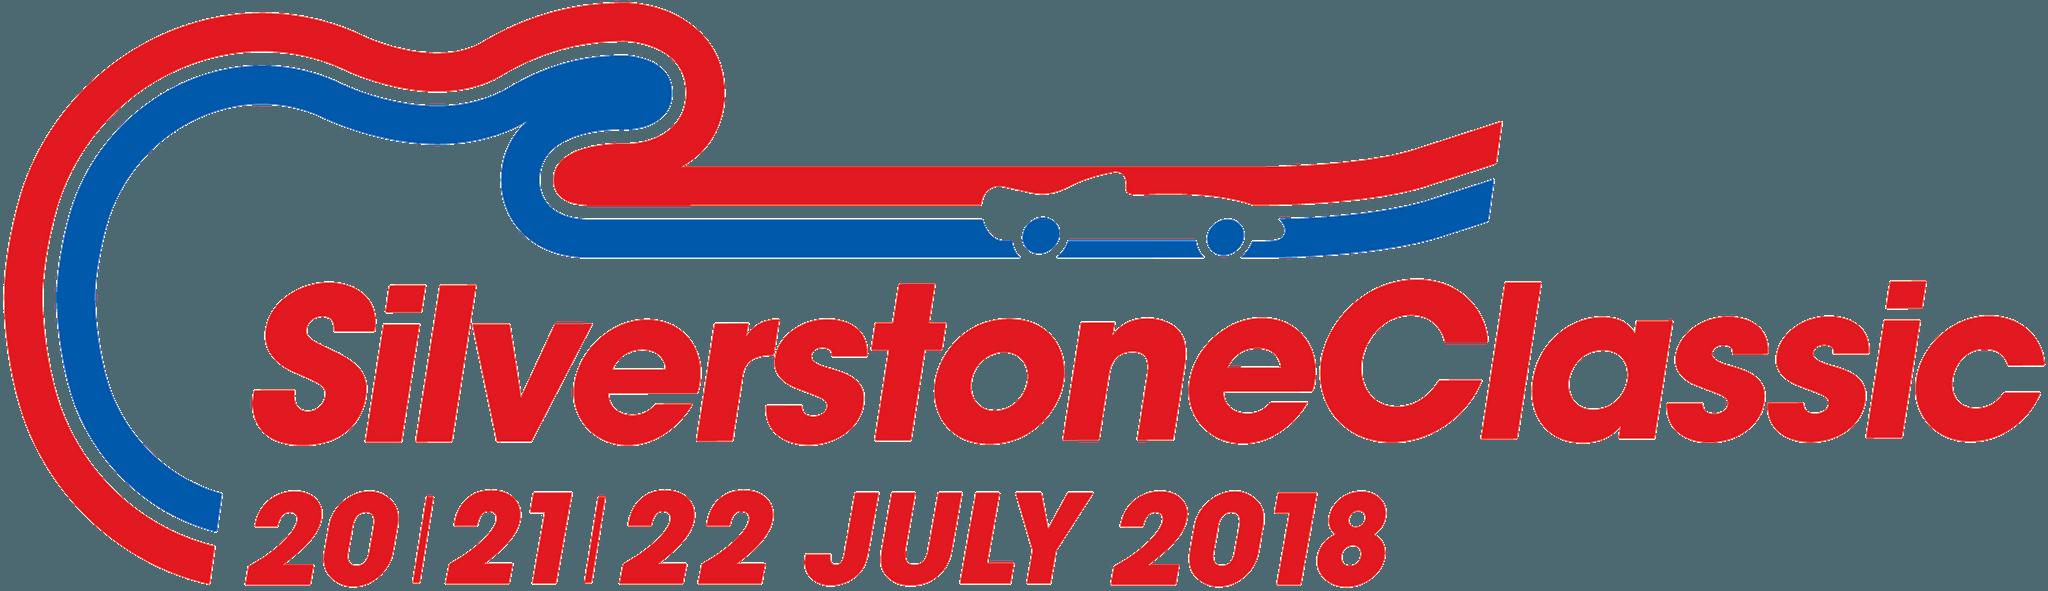 Silverstone Classic Logo